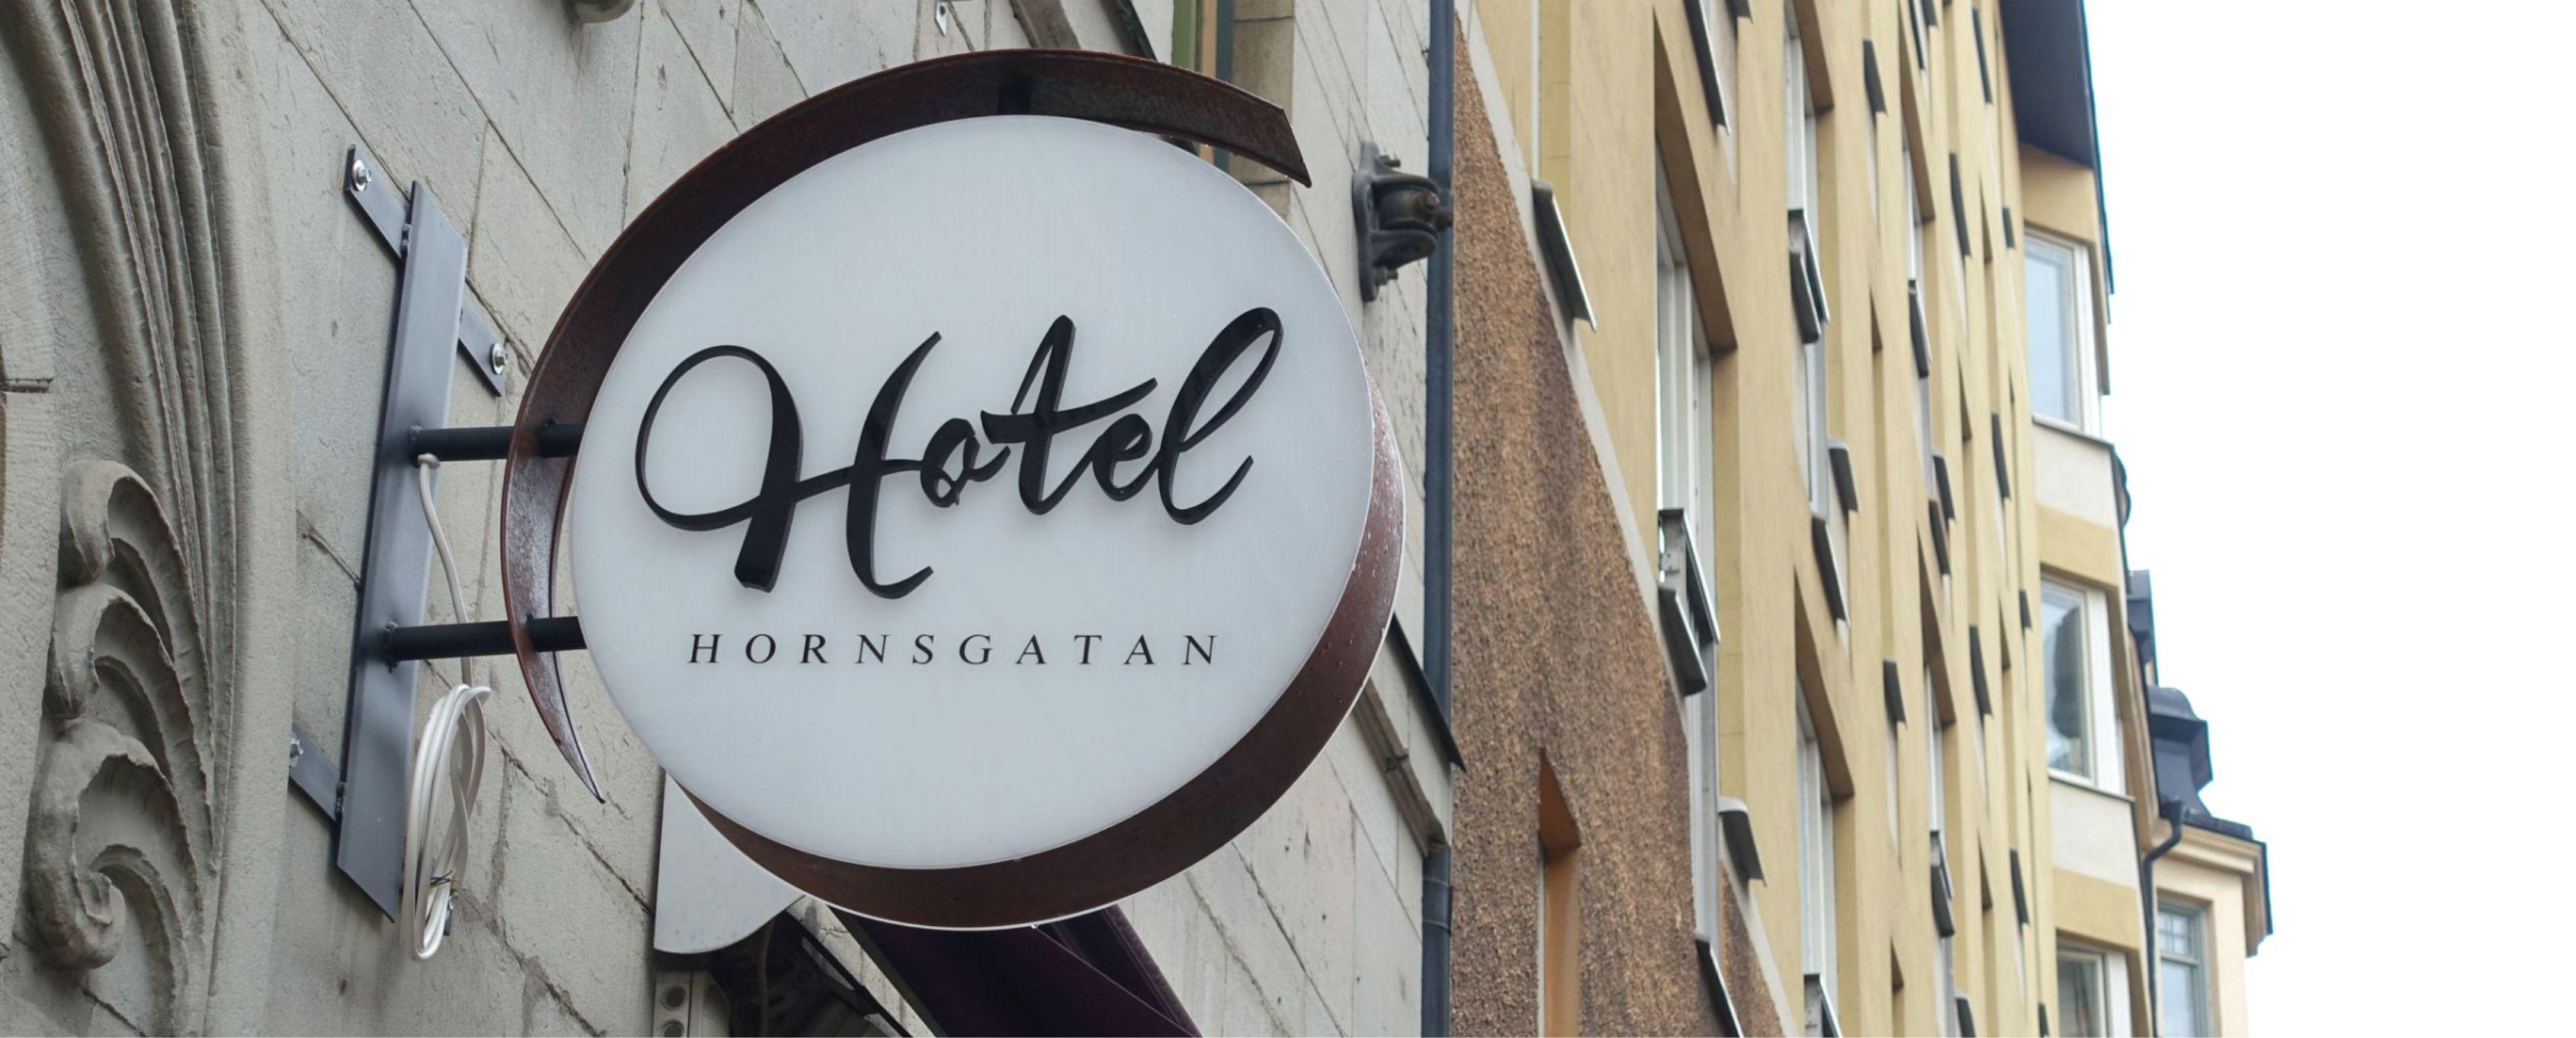 ljuslada hotel